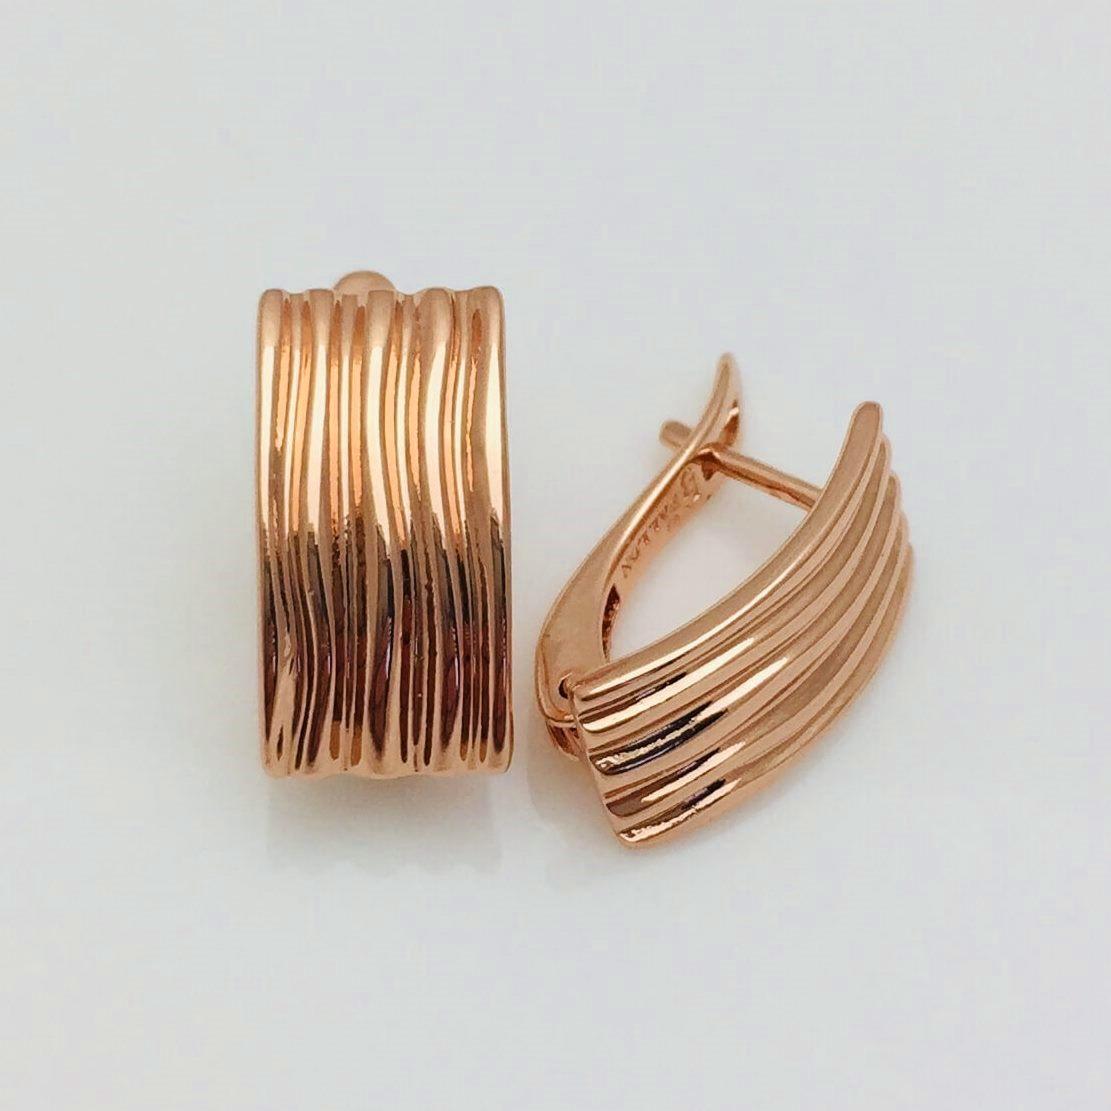 Сережки FJ FALLON довжина 1.7см медичне золото F1067